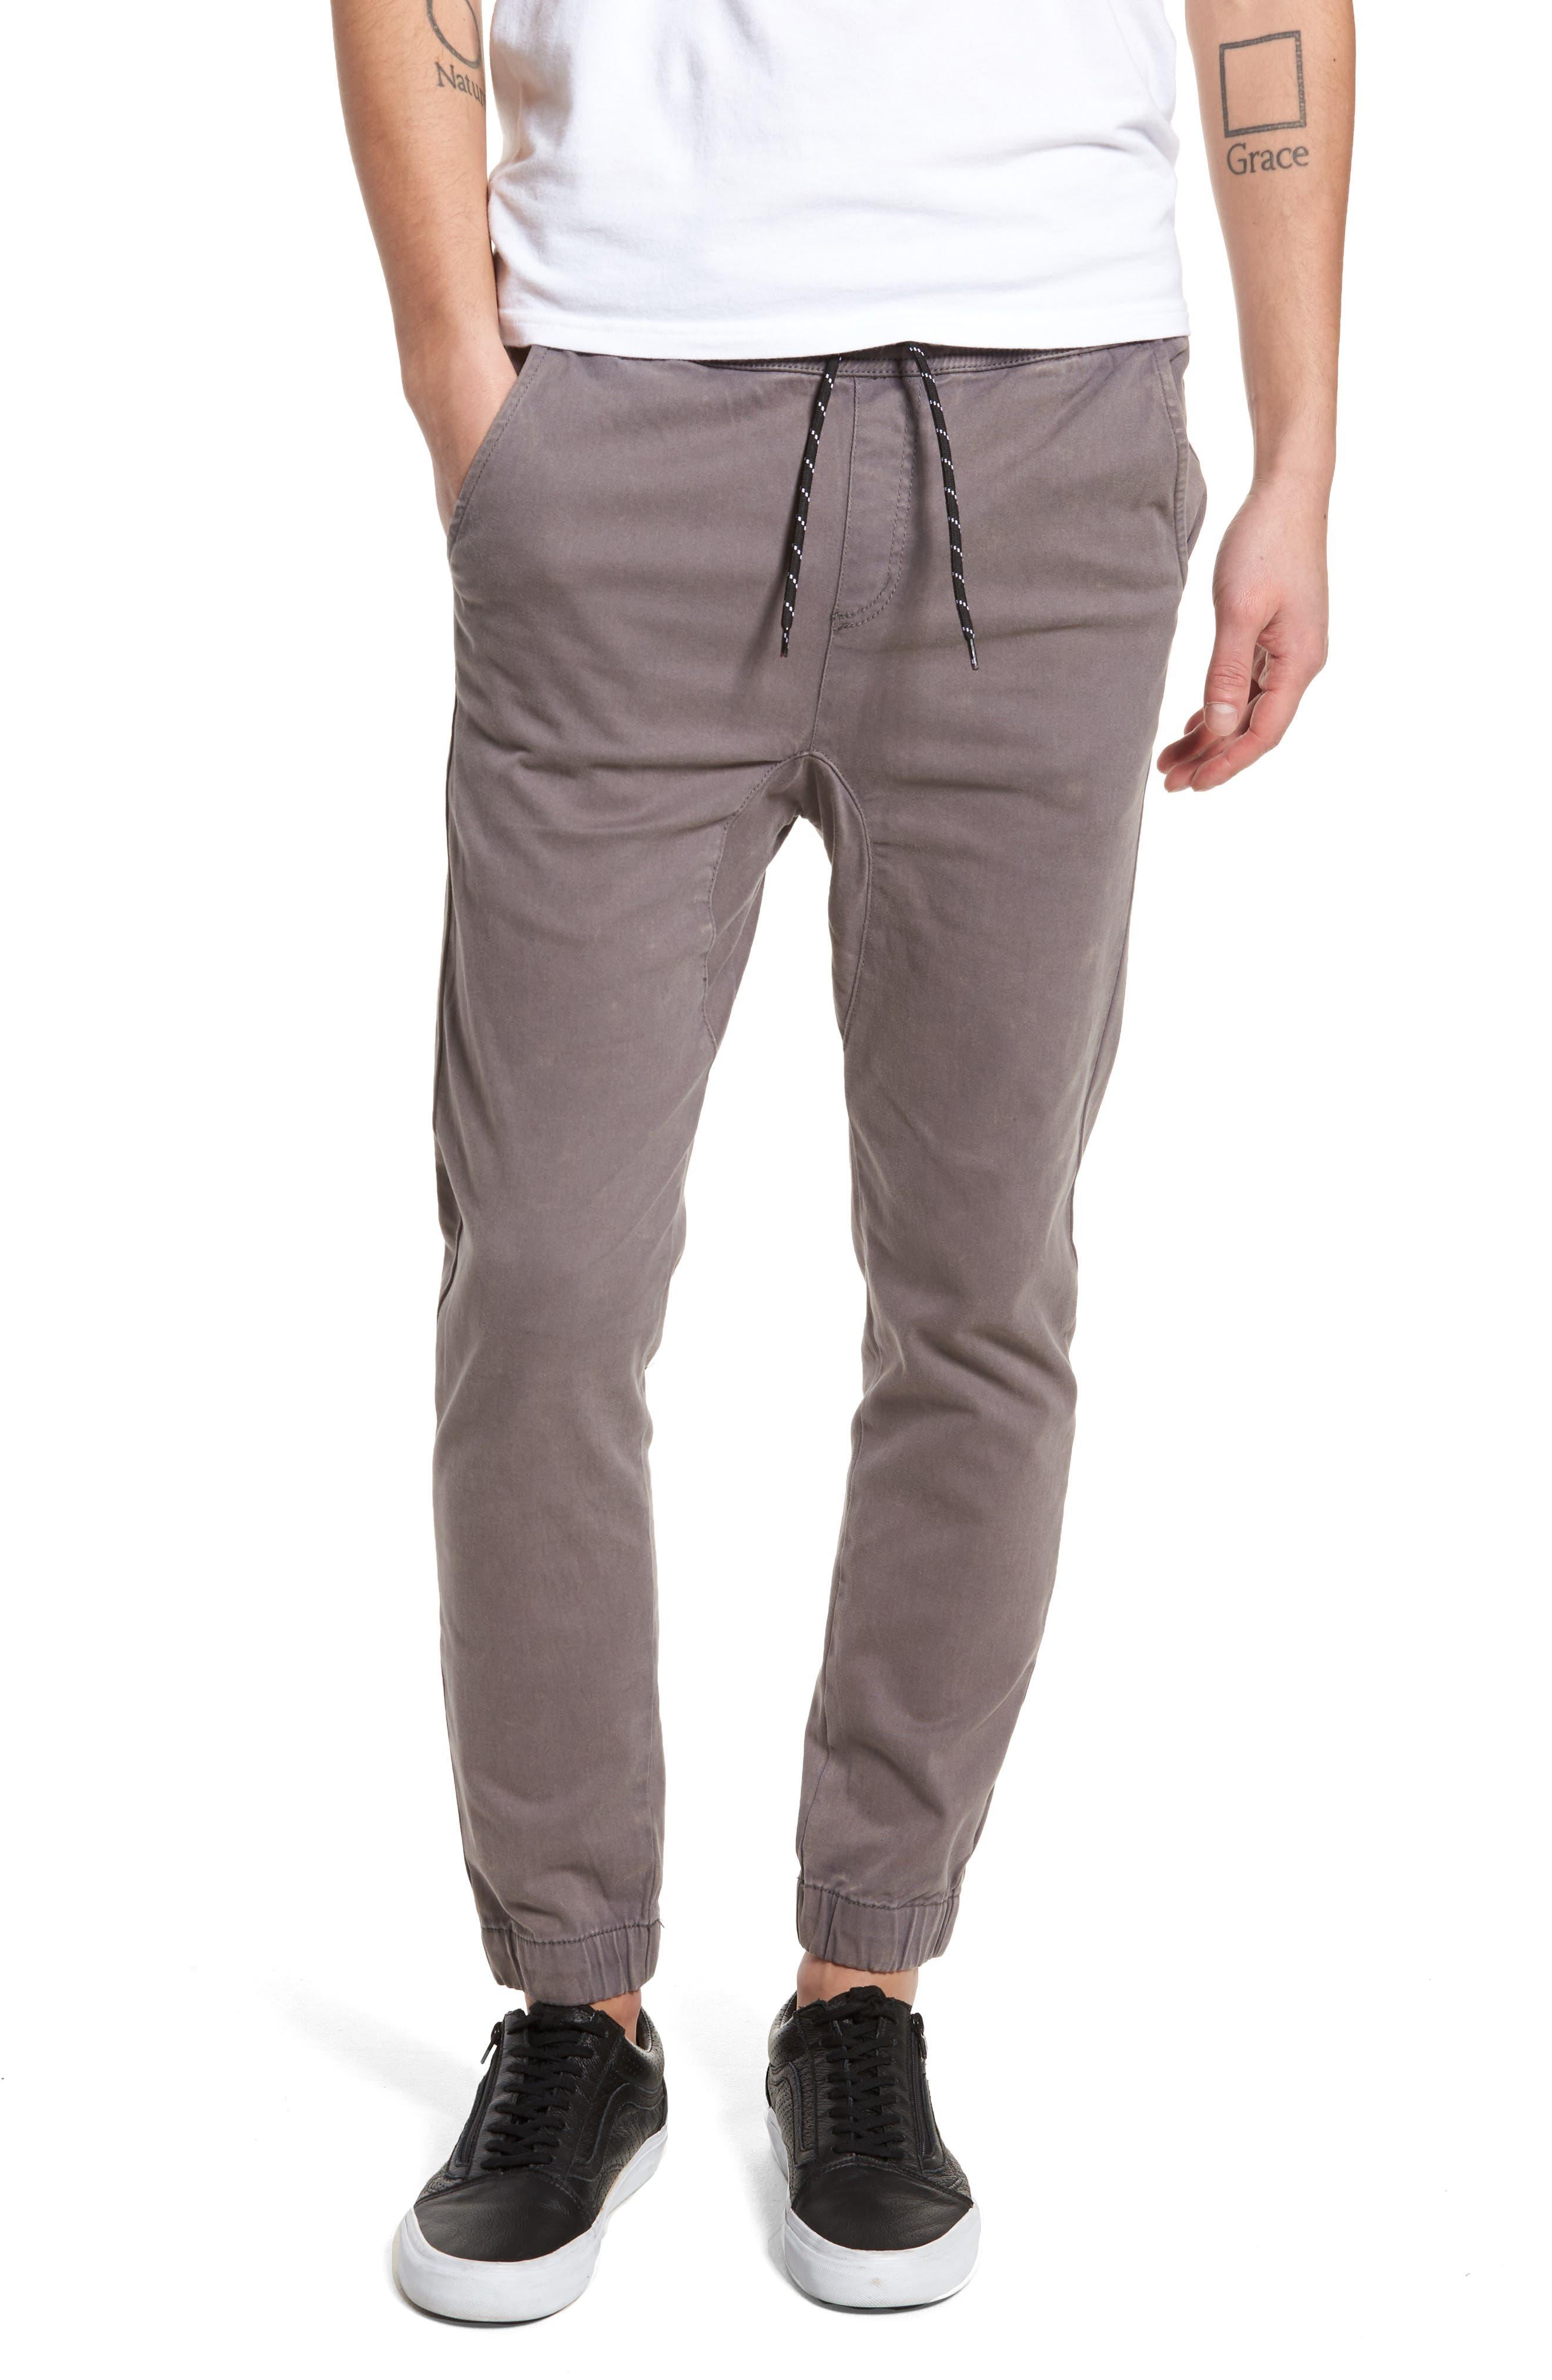 Lira Clothing Alvaro Jogger Pants